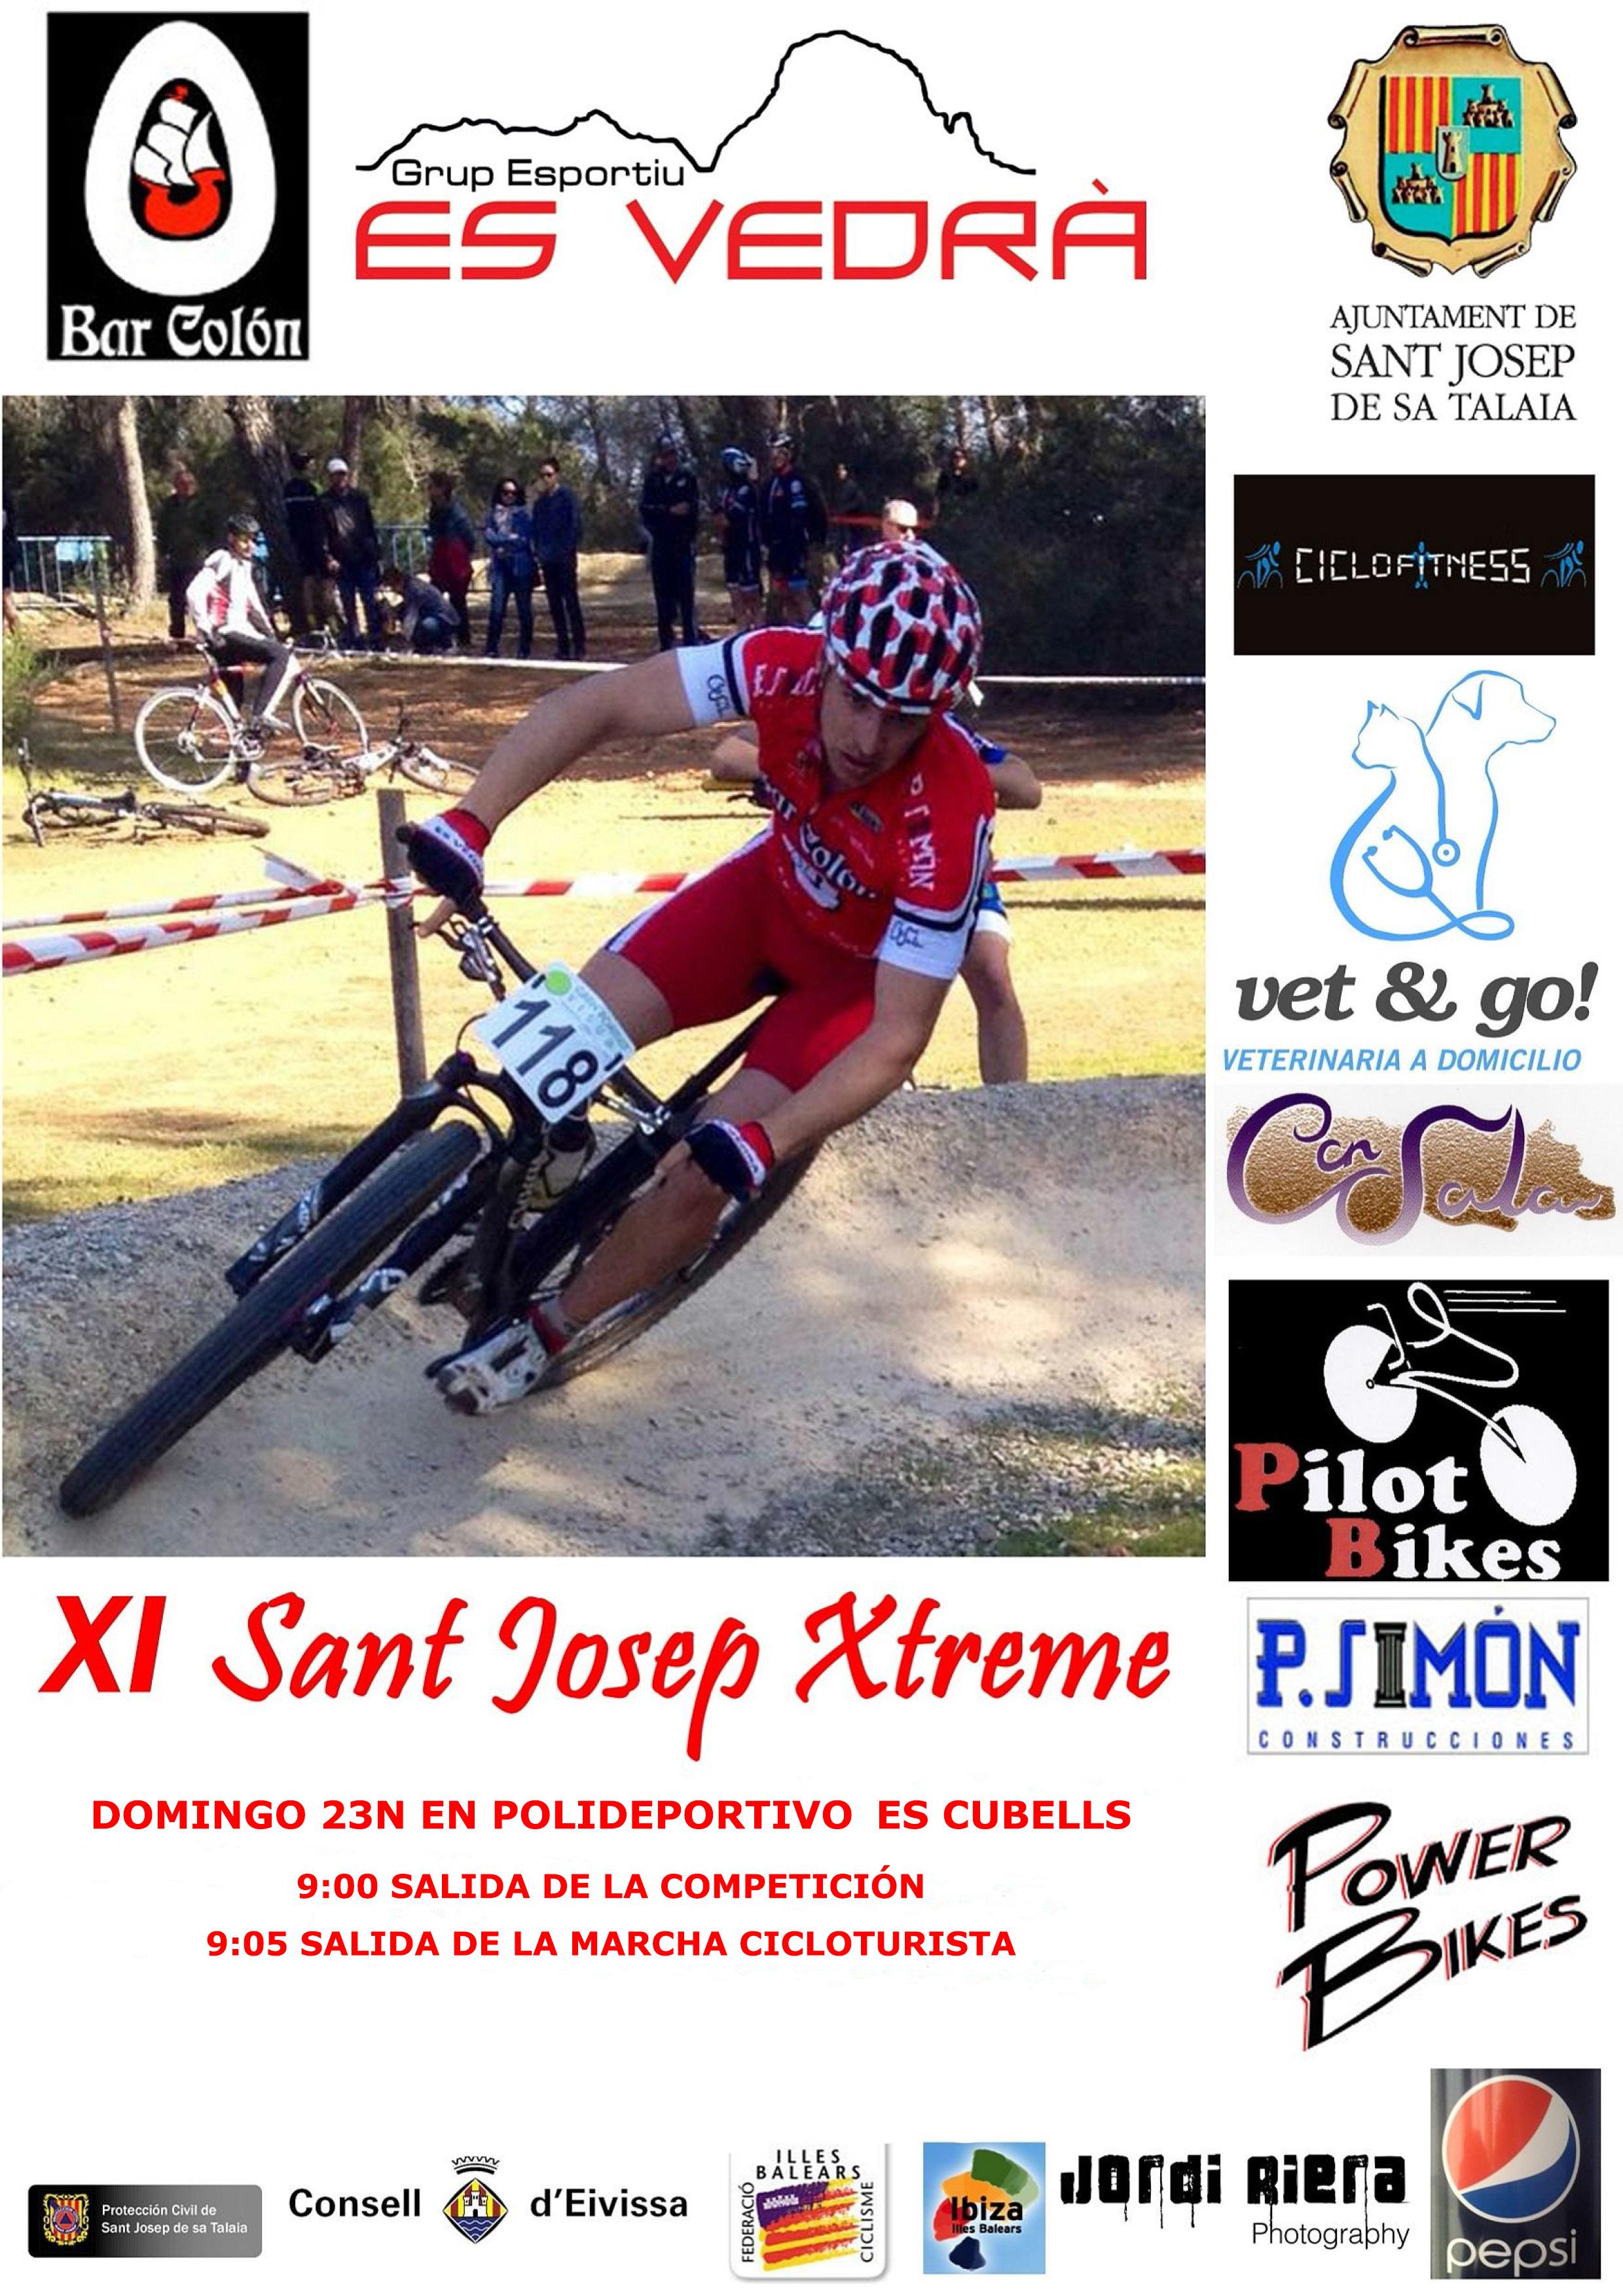 CARTEL SANT JOSEP XTREME 2014